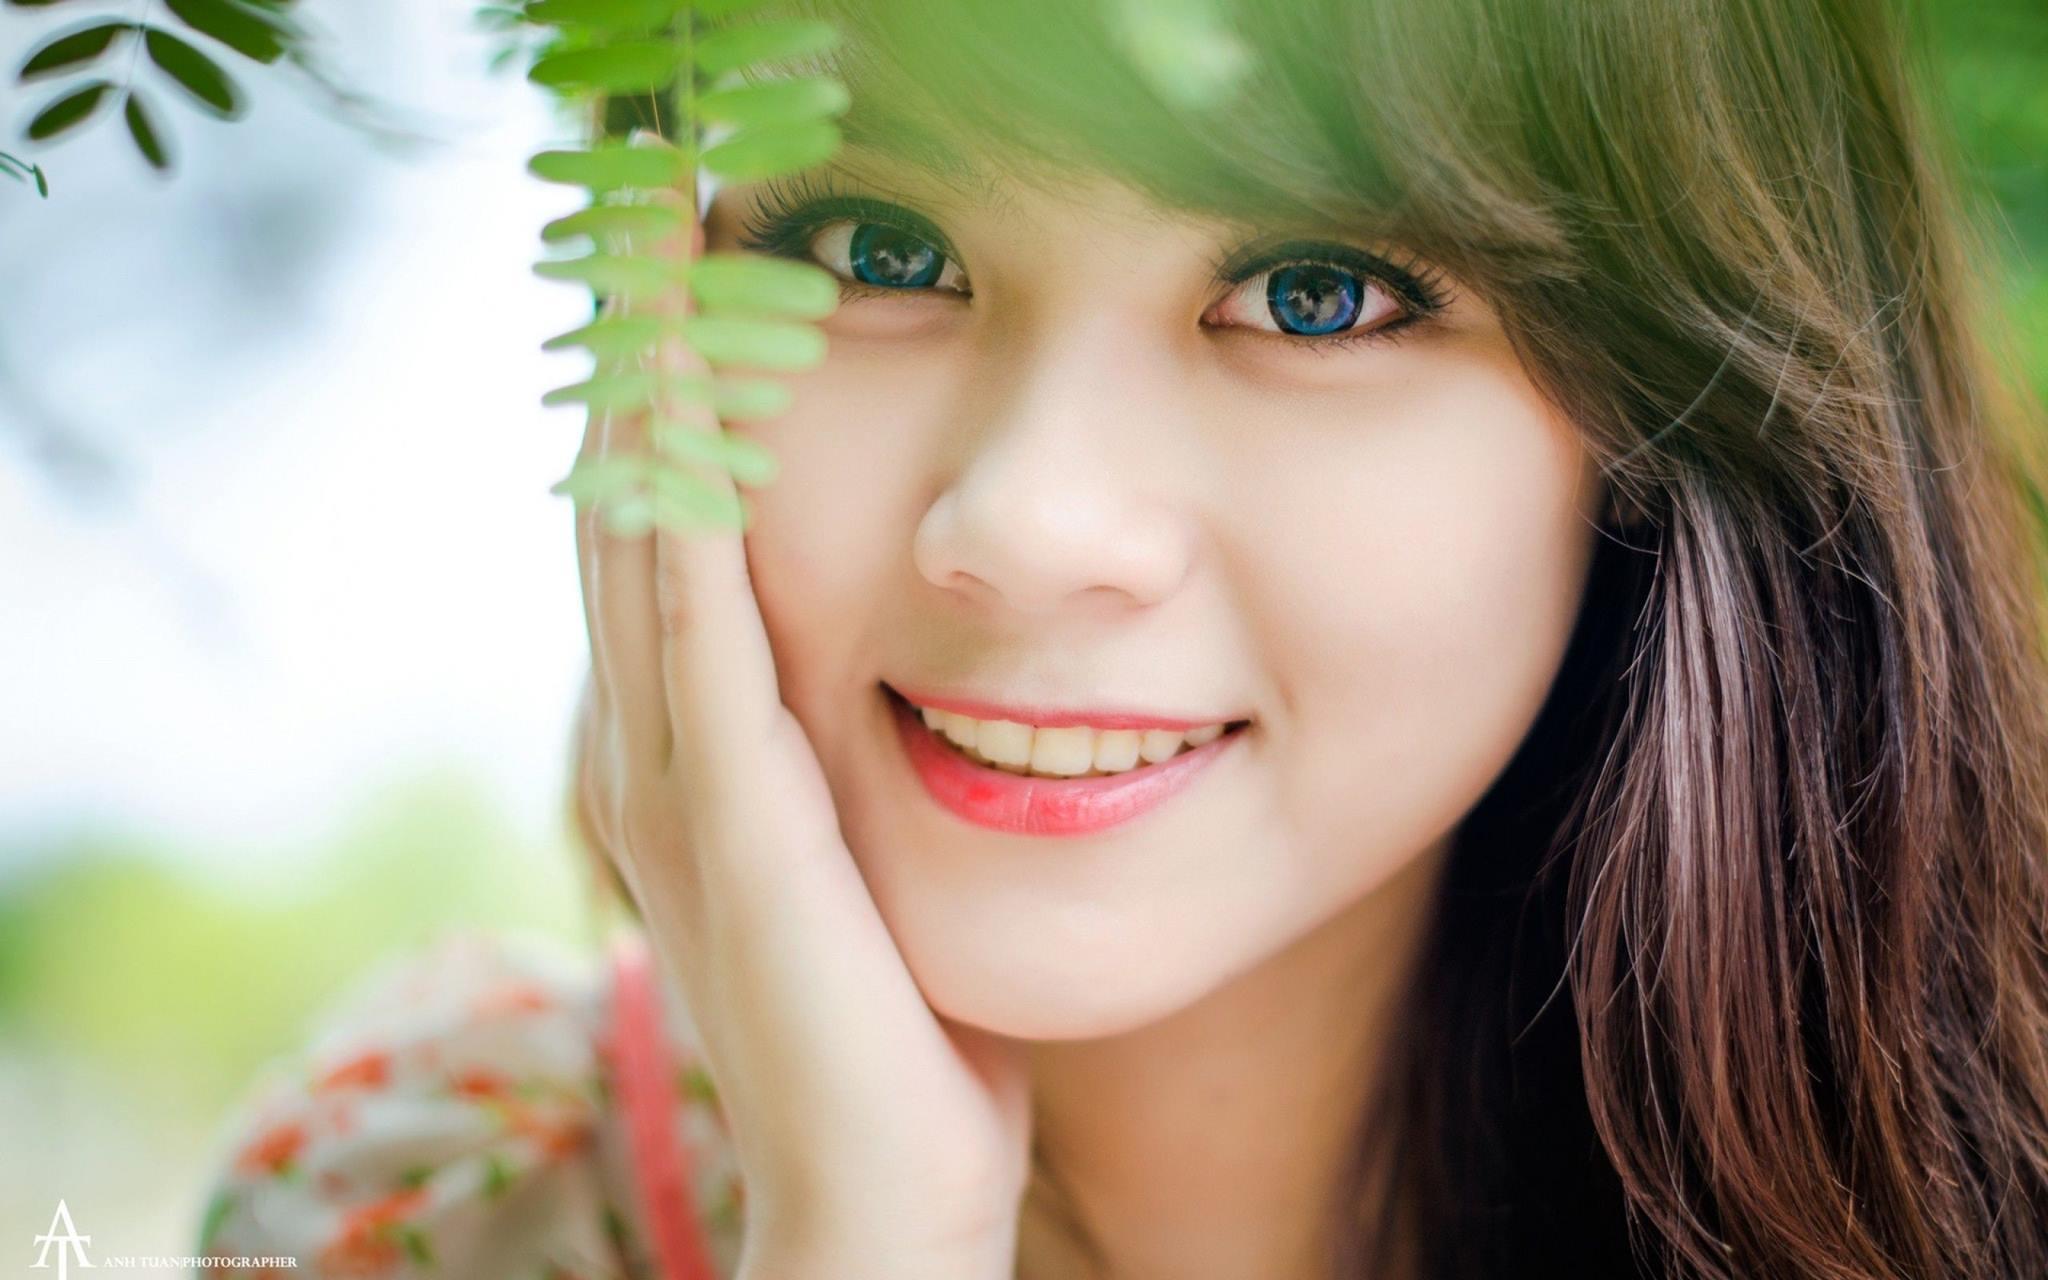 اجمل عيون 5 صور اجمل بنات و اجمل عيون